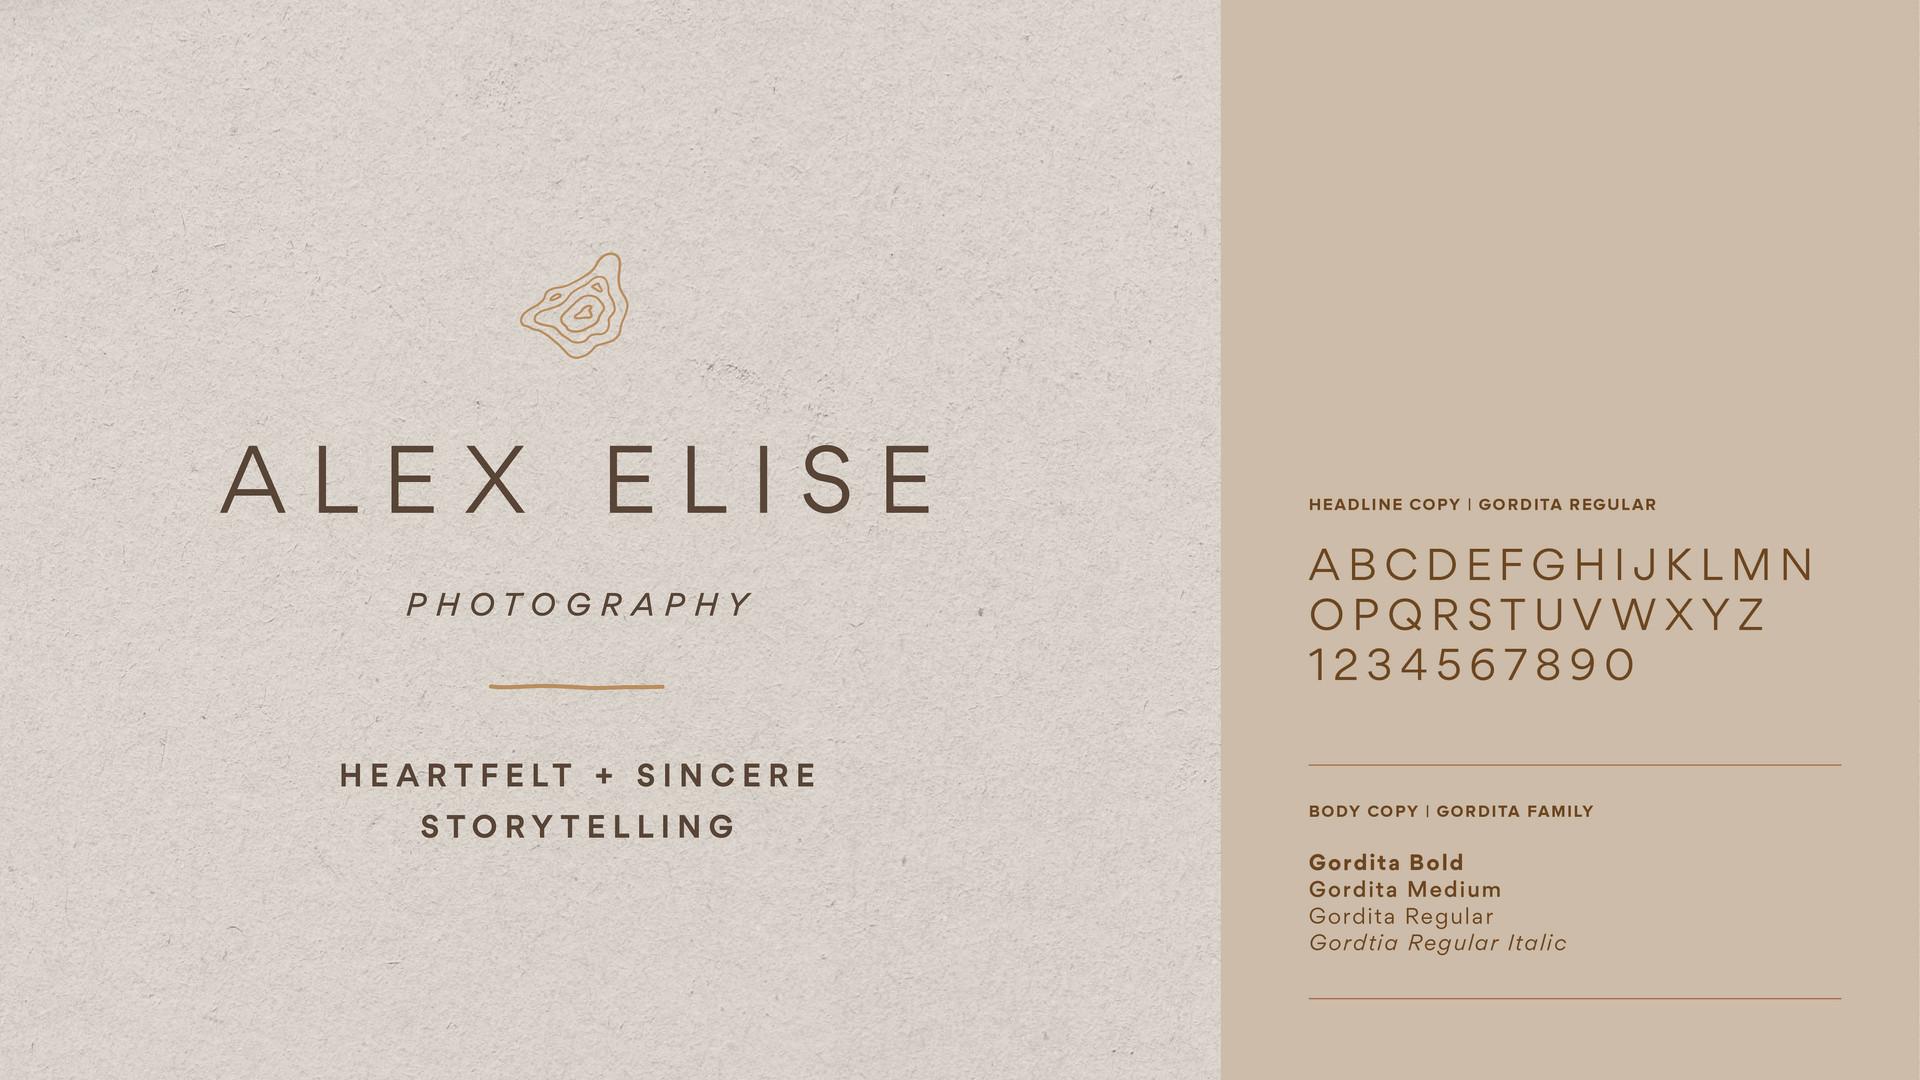 typography design for photographer branding